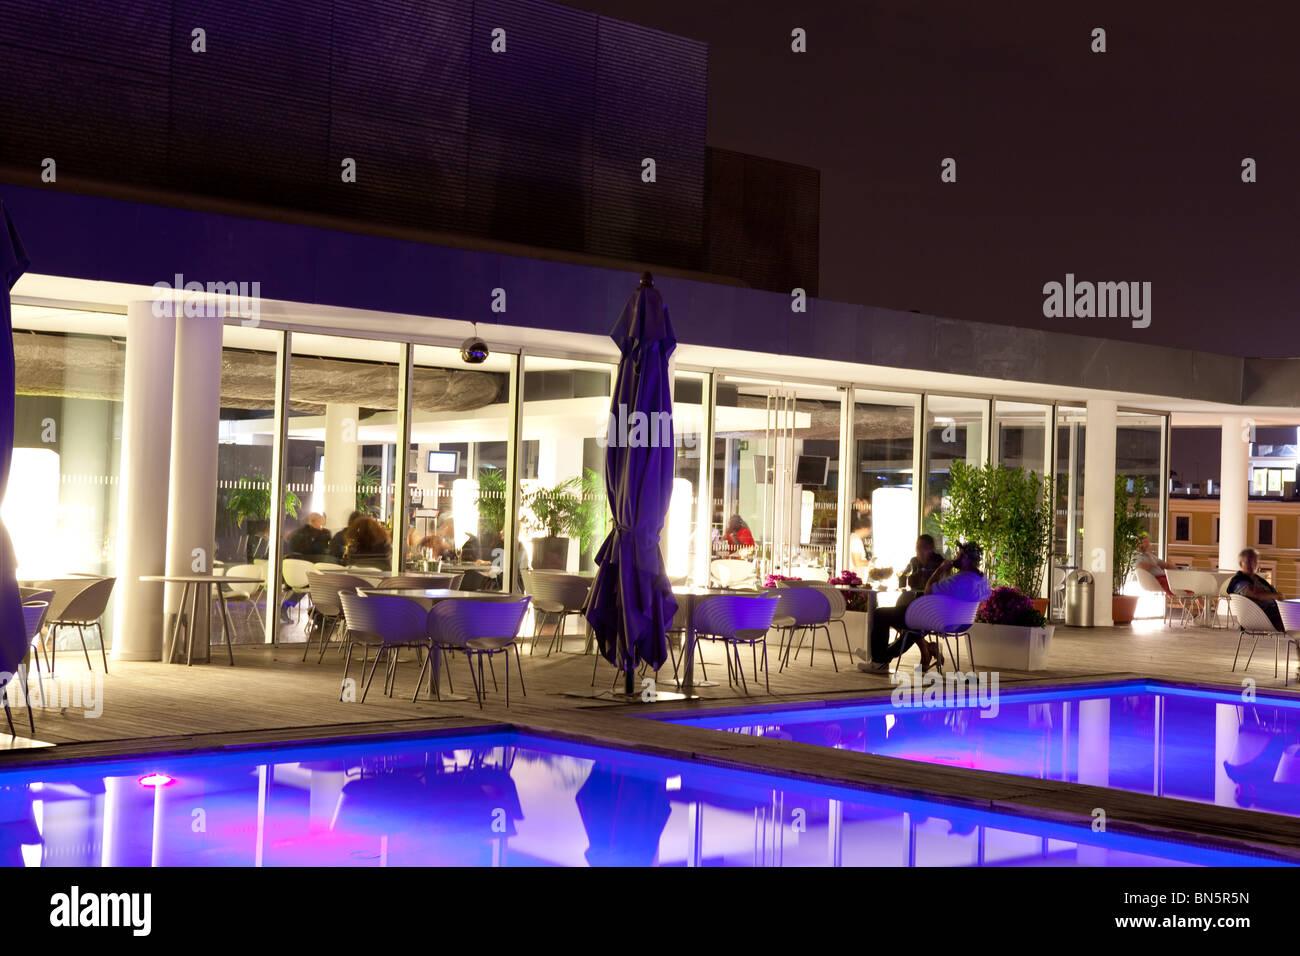 Radisson blu hotel Rome Italy - Stock Image